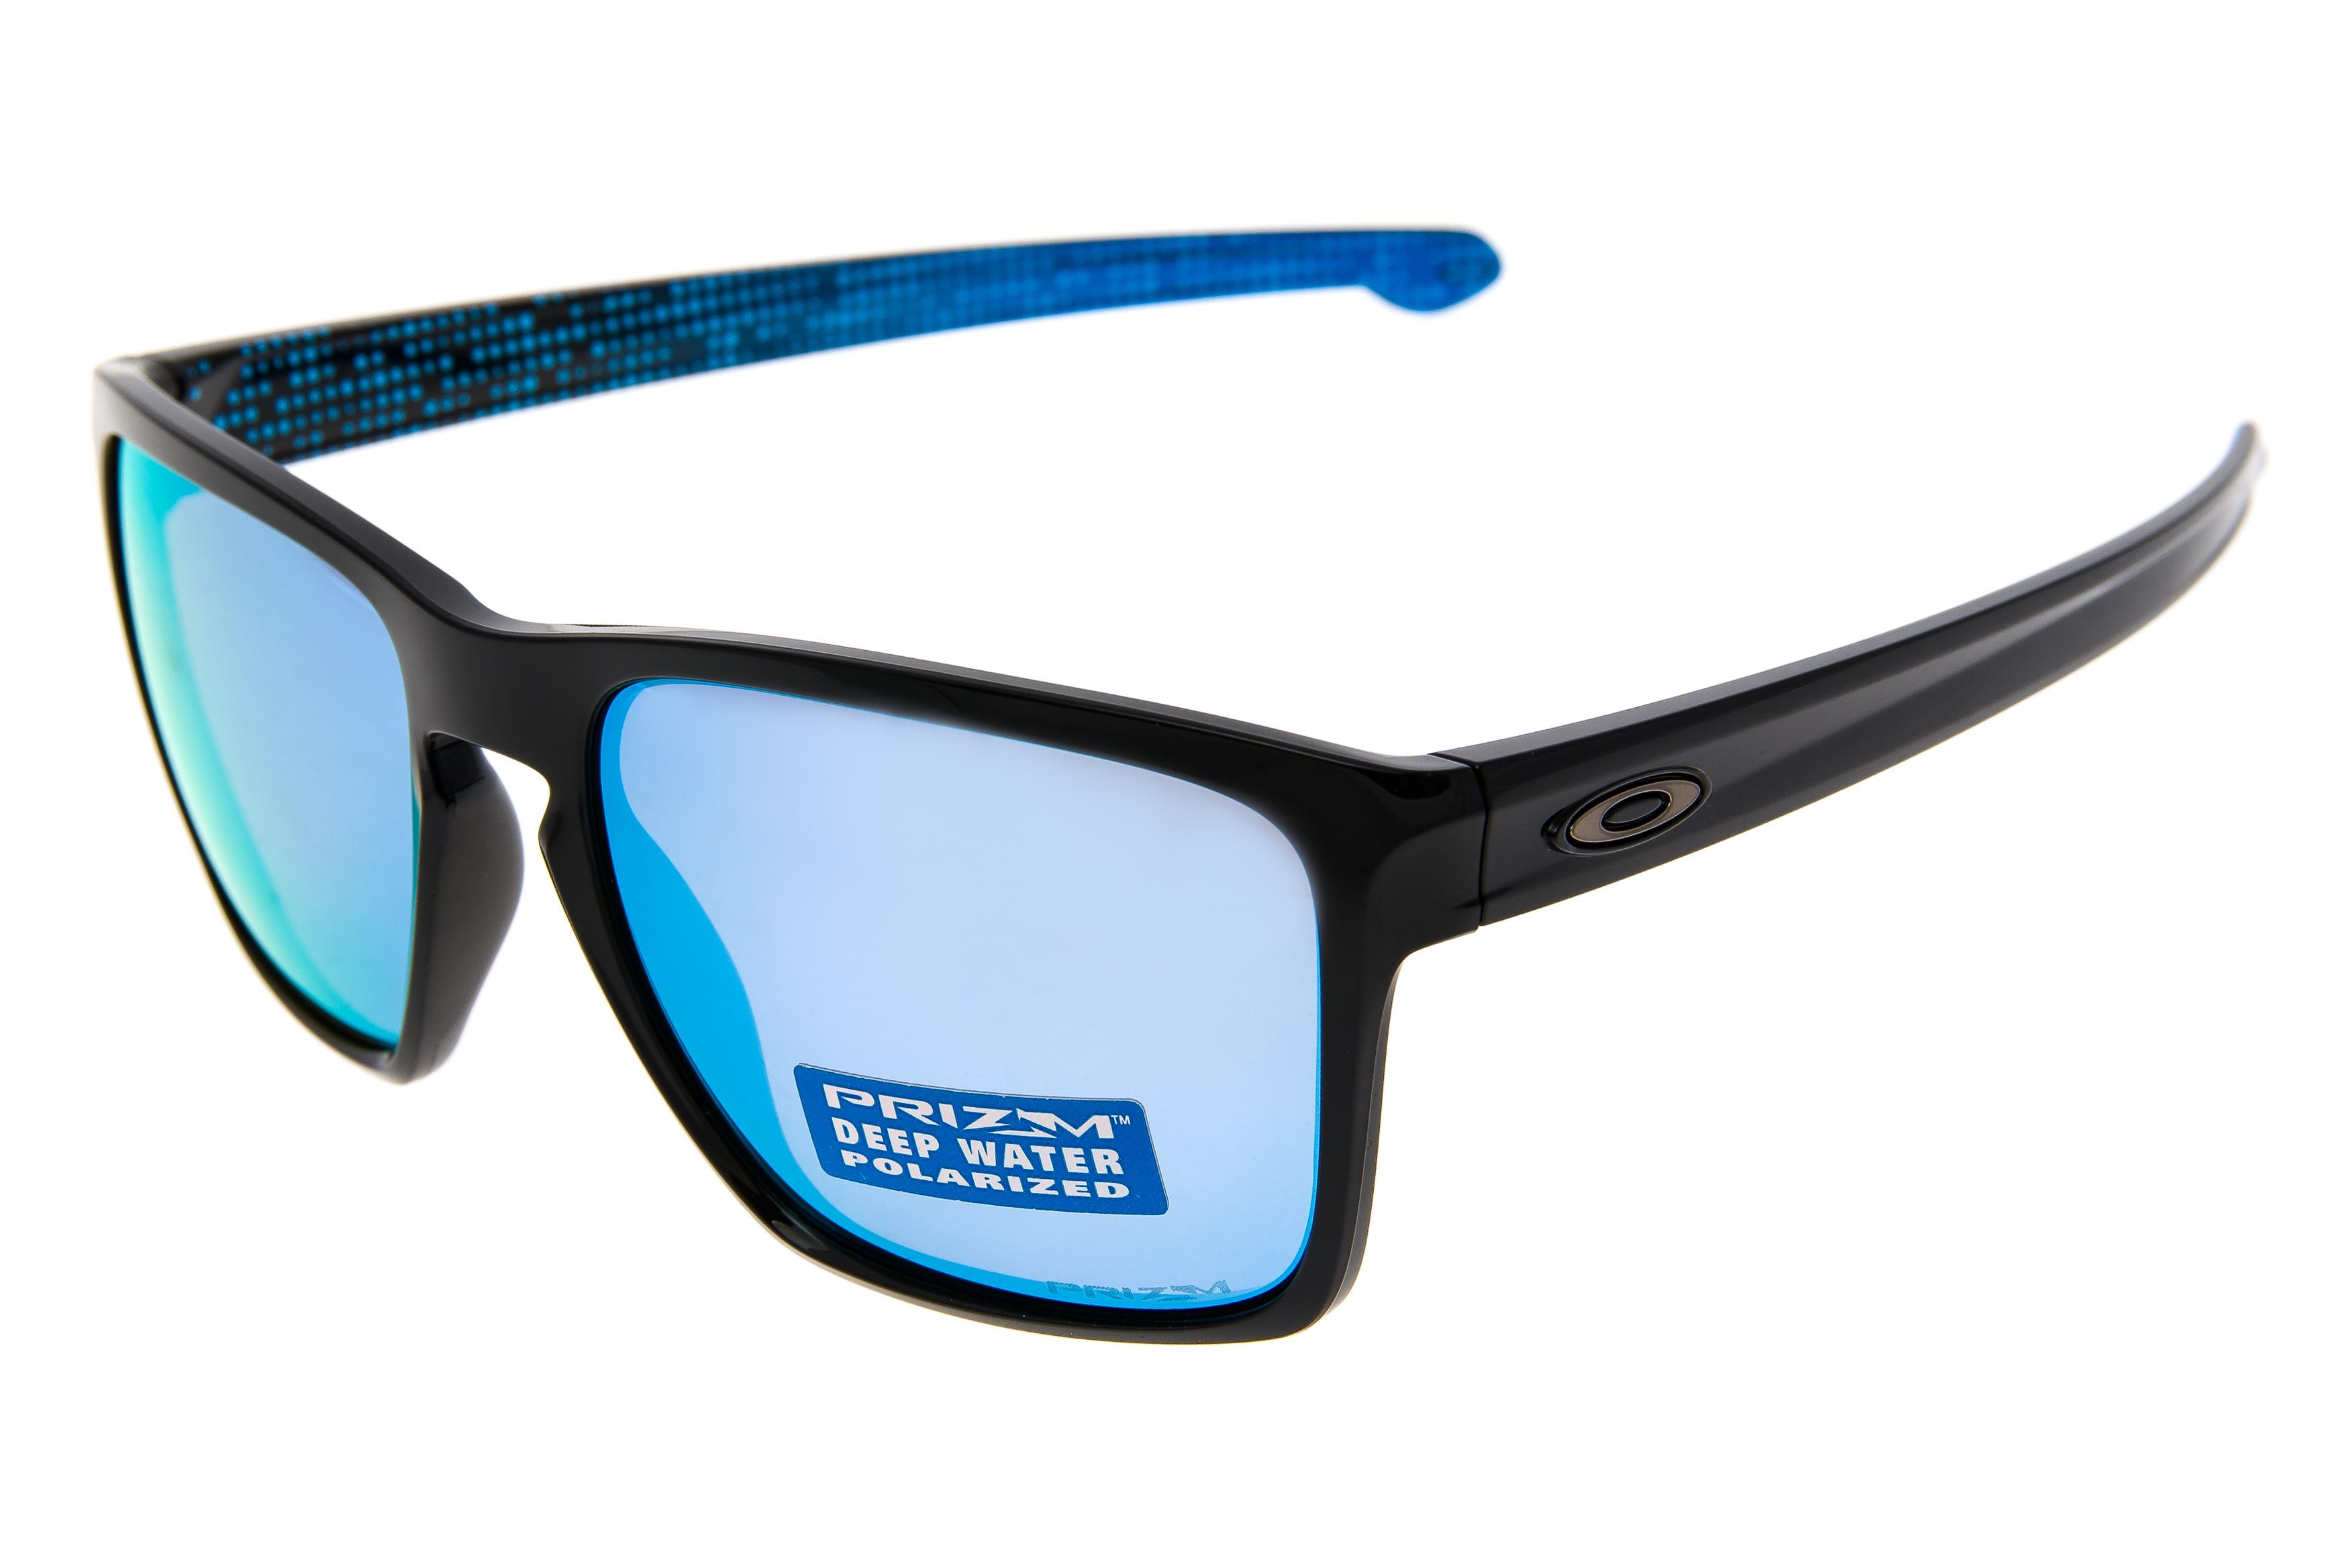 f2c1540d8f Details about Oakley Sliver XL Sunglasses Polished Black Frame Prizm Deep  Water Polarized Lens